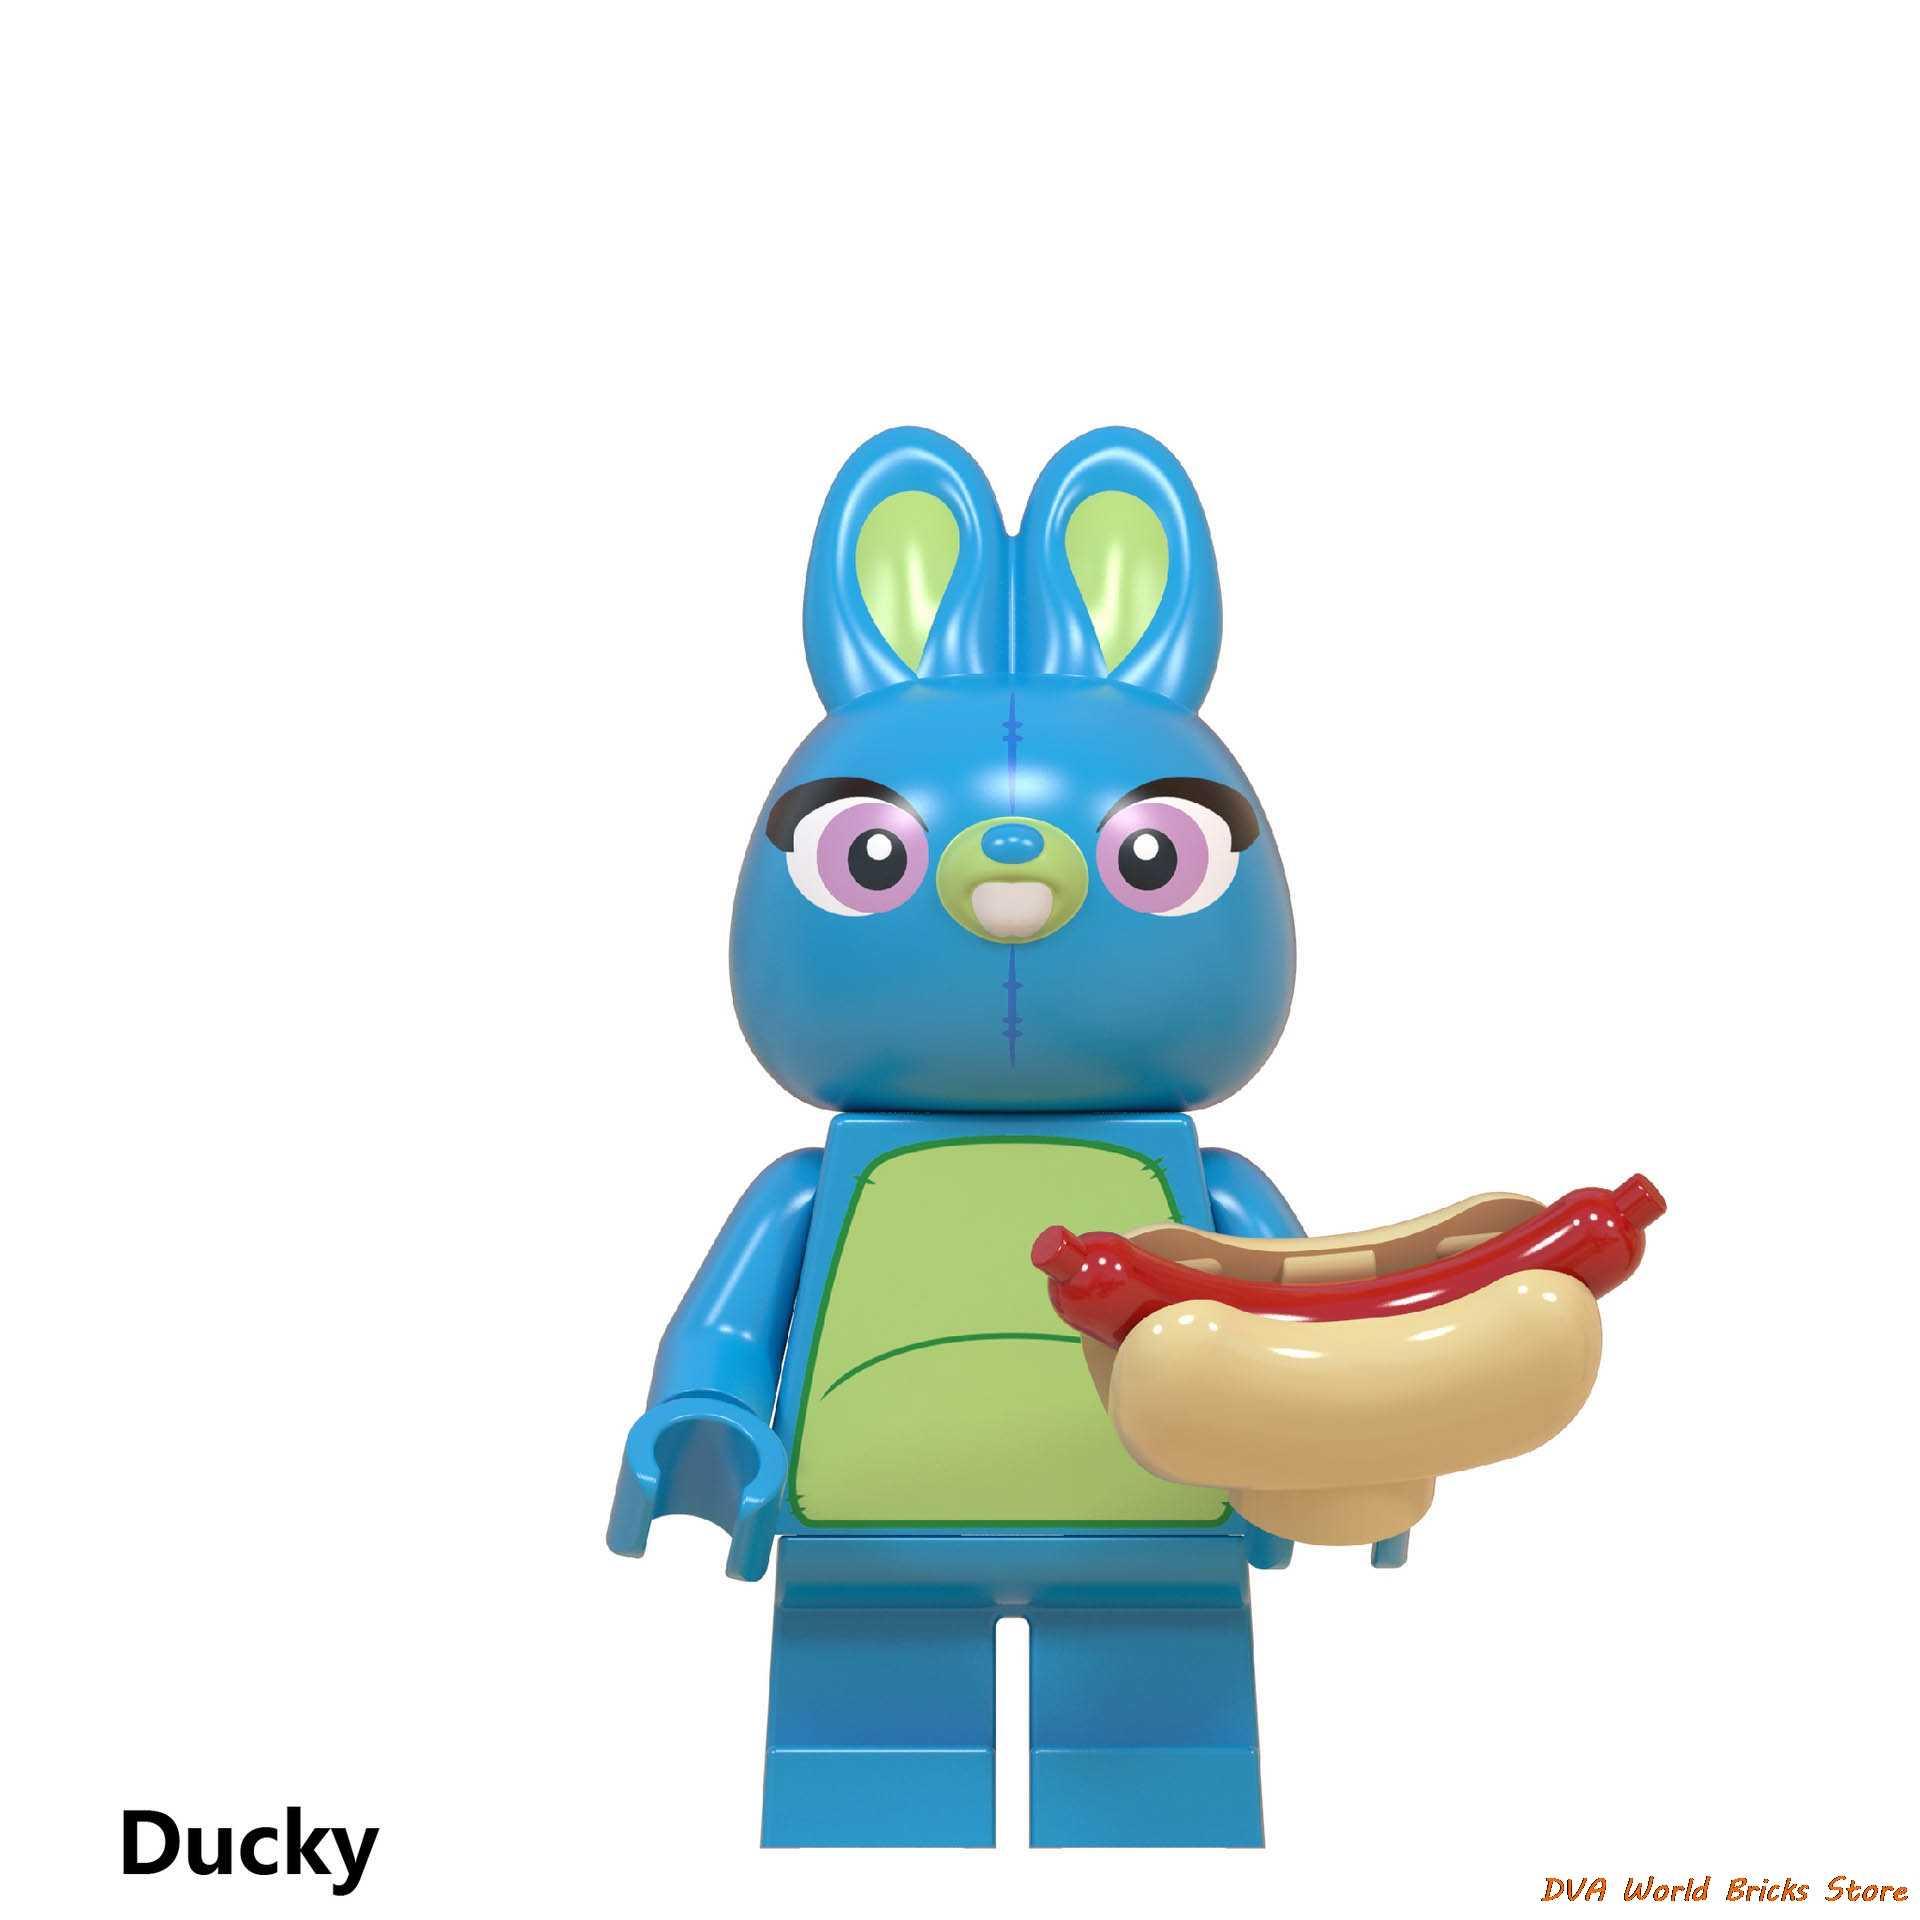 Mainan Cerita 4 Angka Woody Forky Buzz Lightyear Gaby Merah Hati Alien Jessie Bo Peep Ducky Caboom Blok Bangunan Teman batu Bata